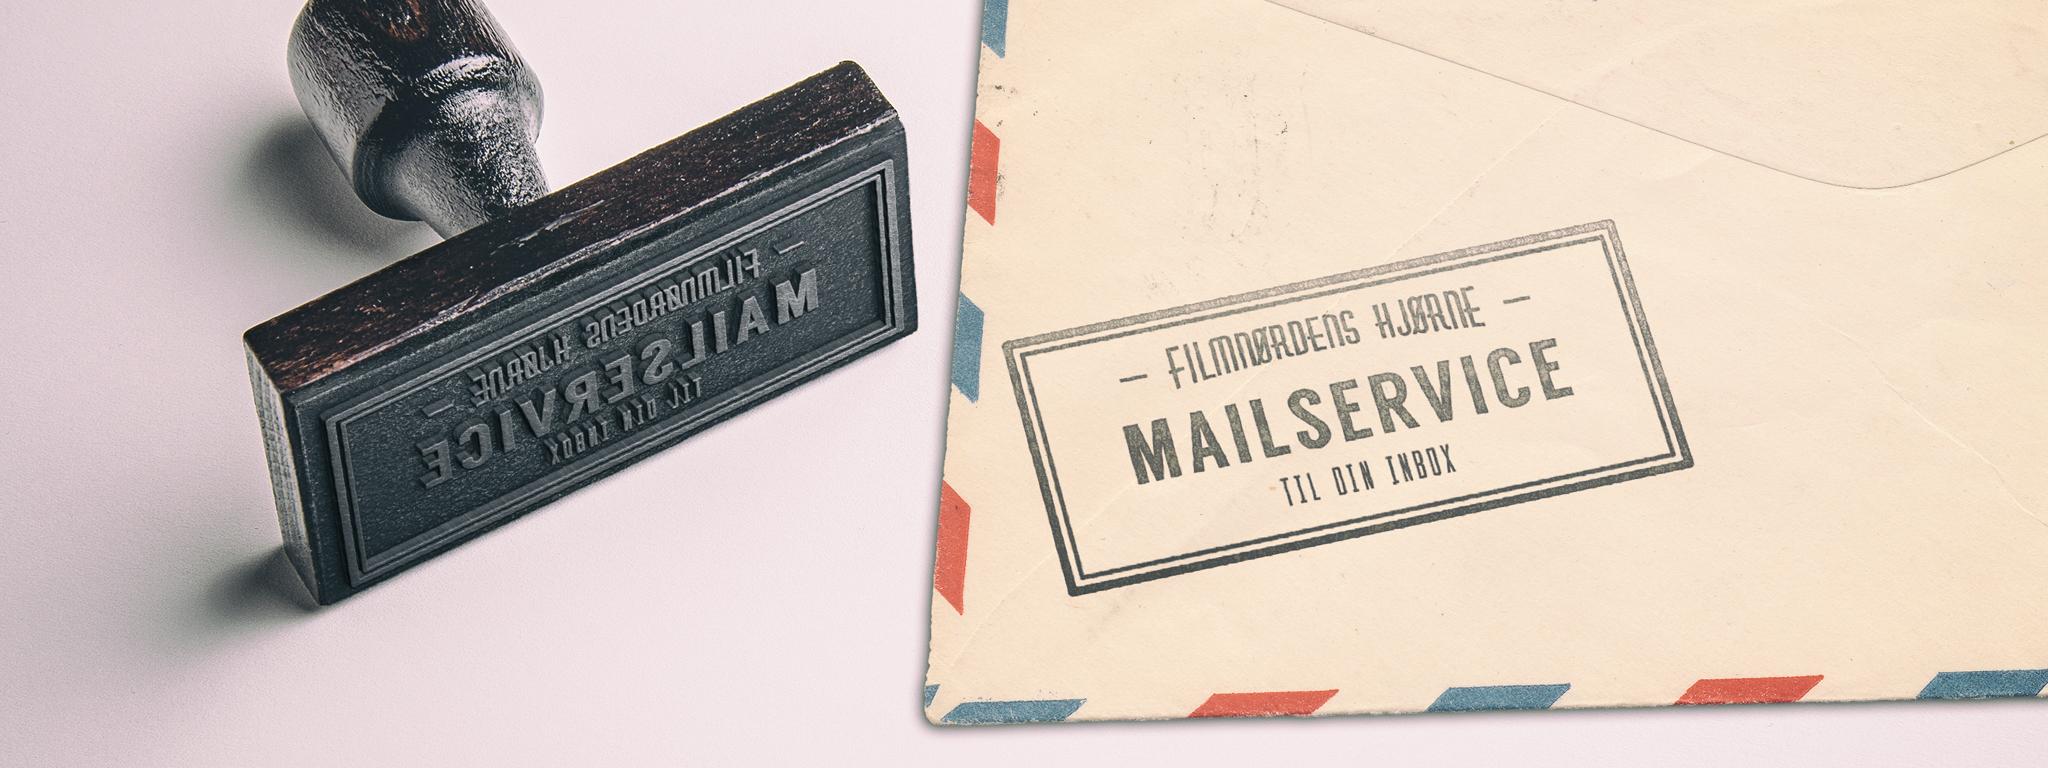 Mail-service mockup flat